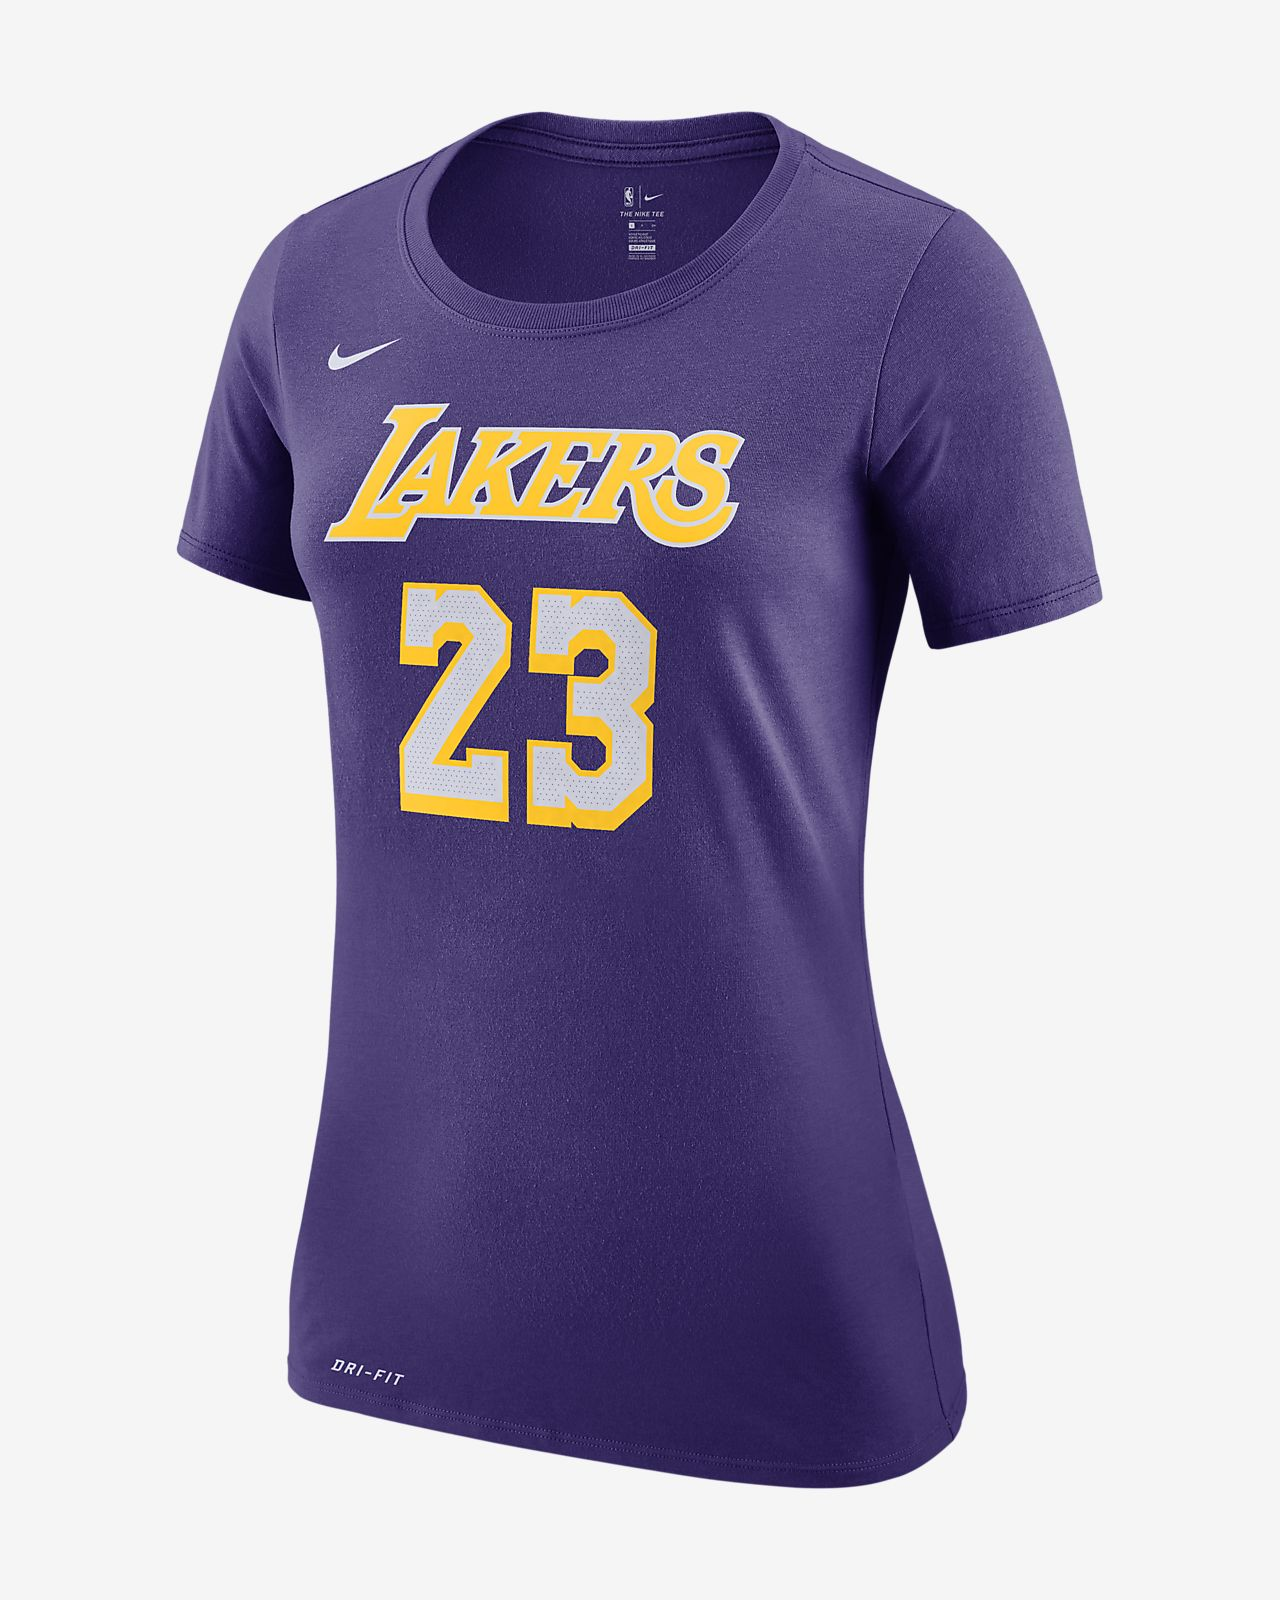 Los Angeles Lakers Nike Dri-FIT Women's NBA T-Shirt